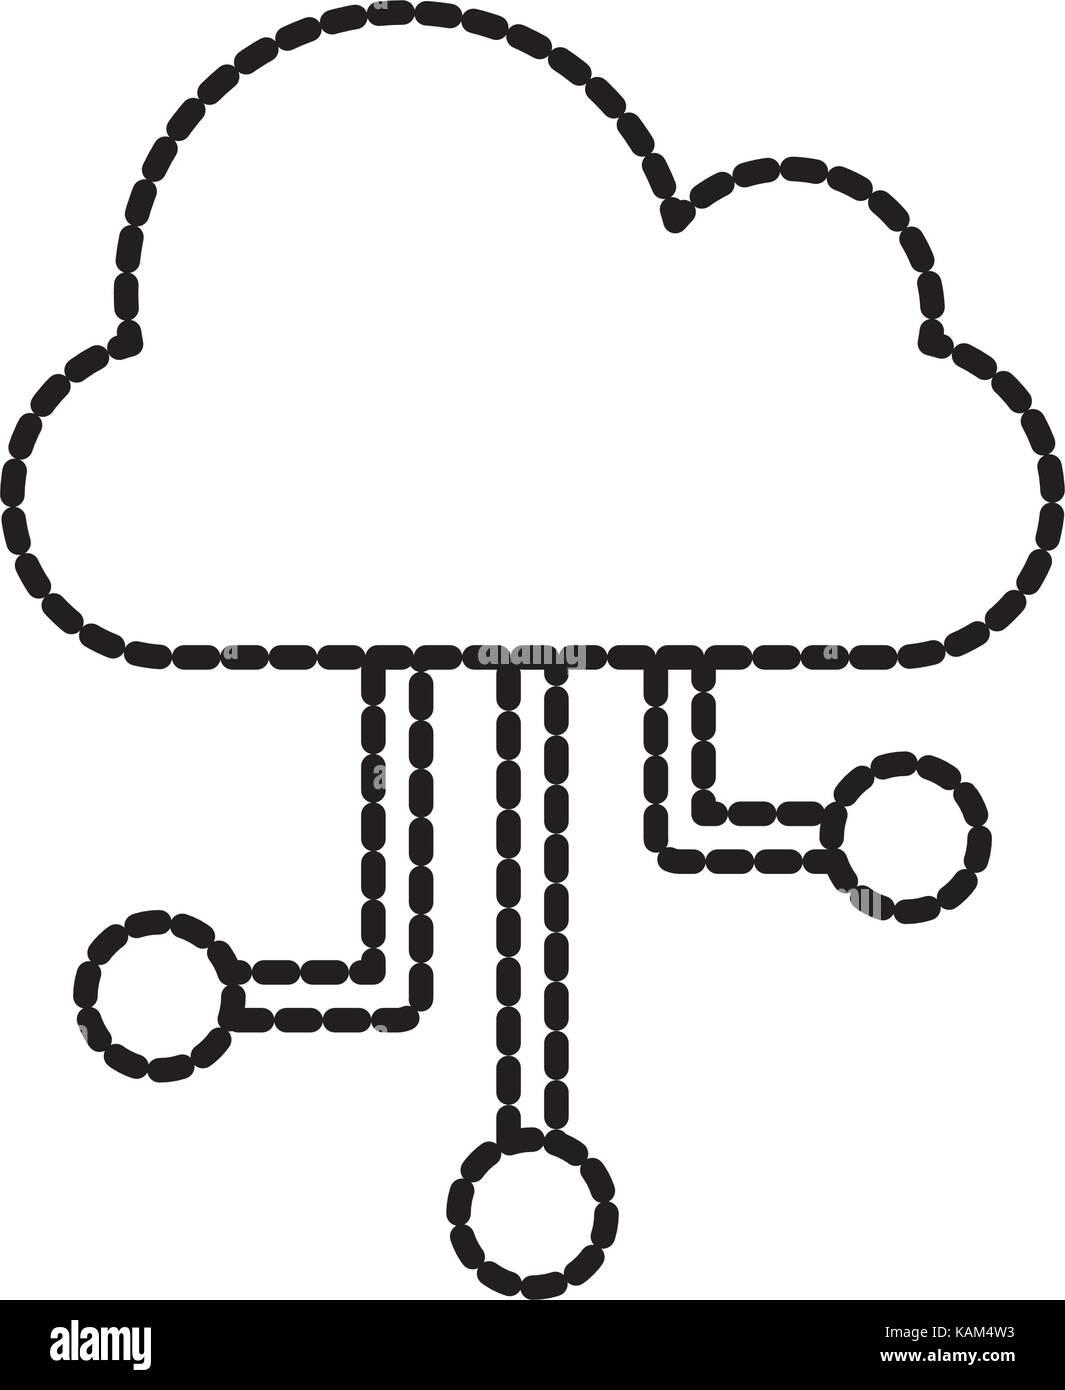 Cloud Computing Technologie Kommunikationsverbindung digitale Vernetzung Stock Vektor